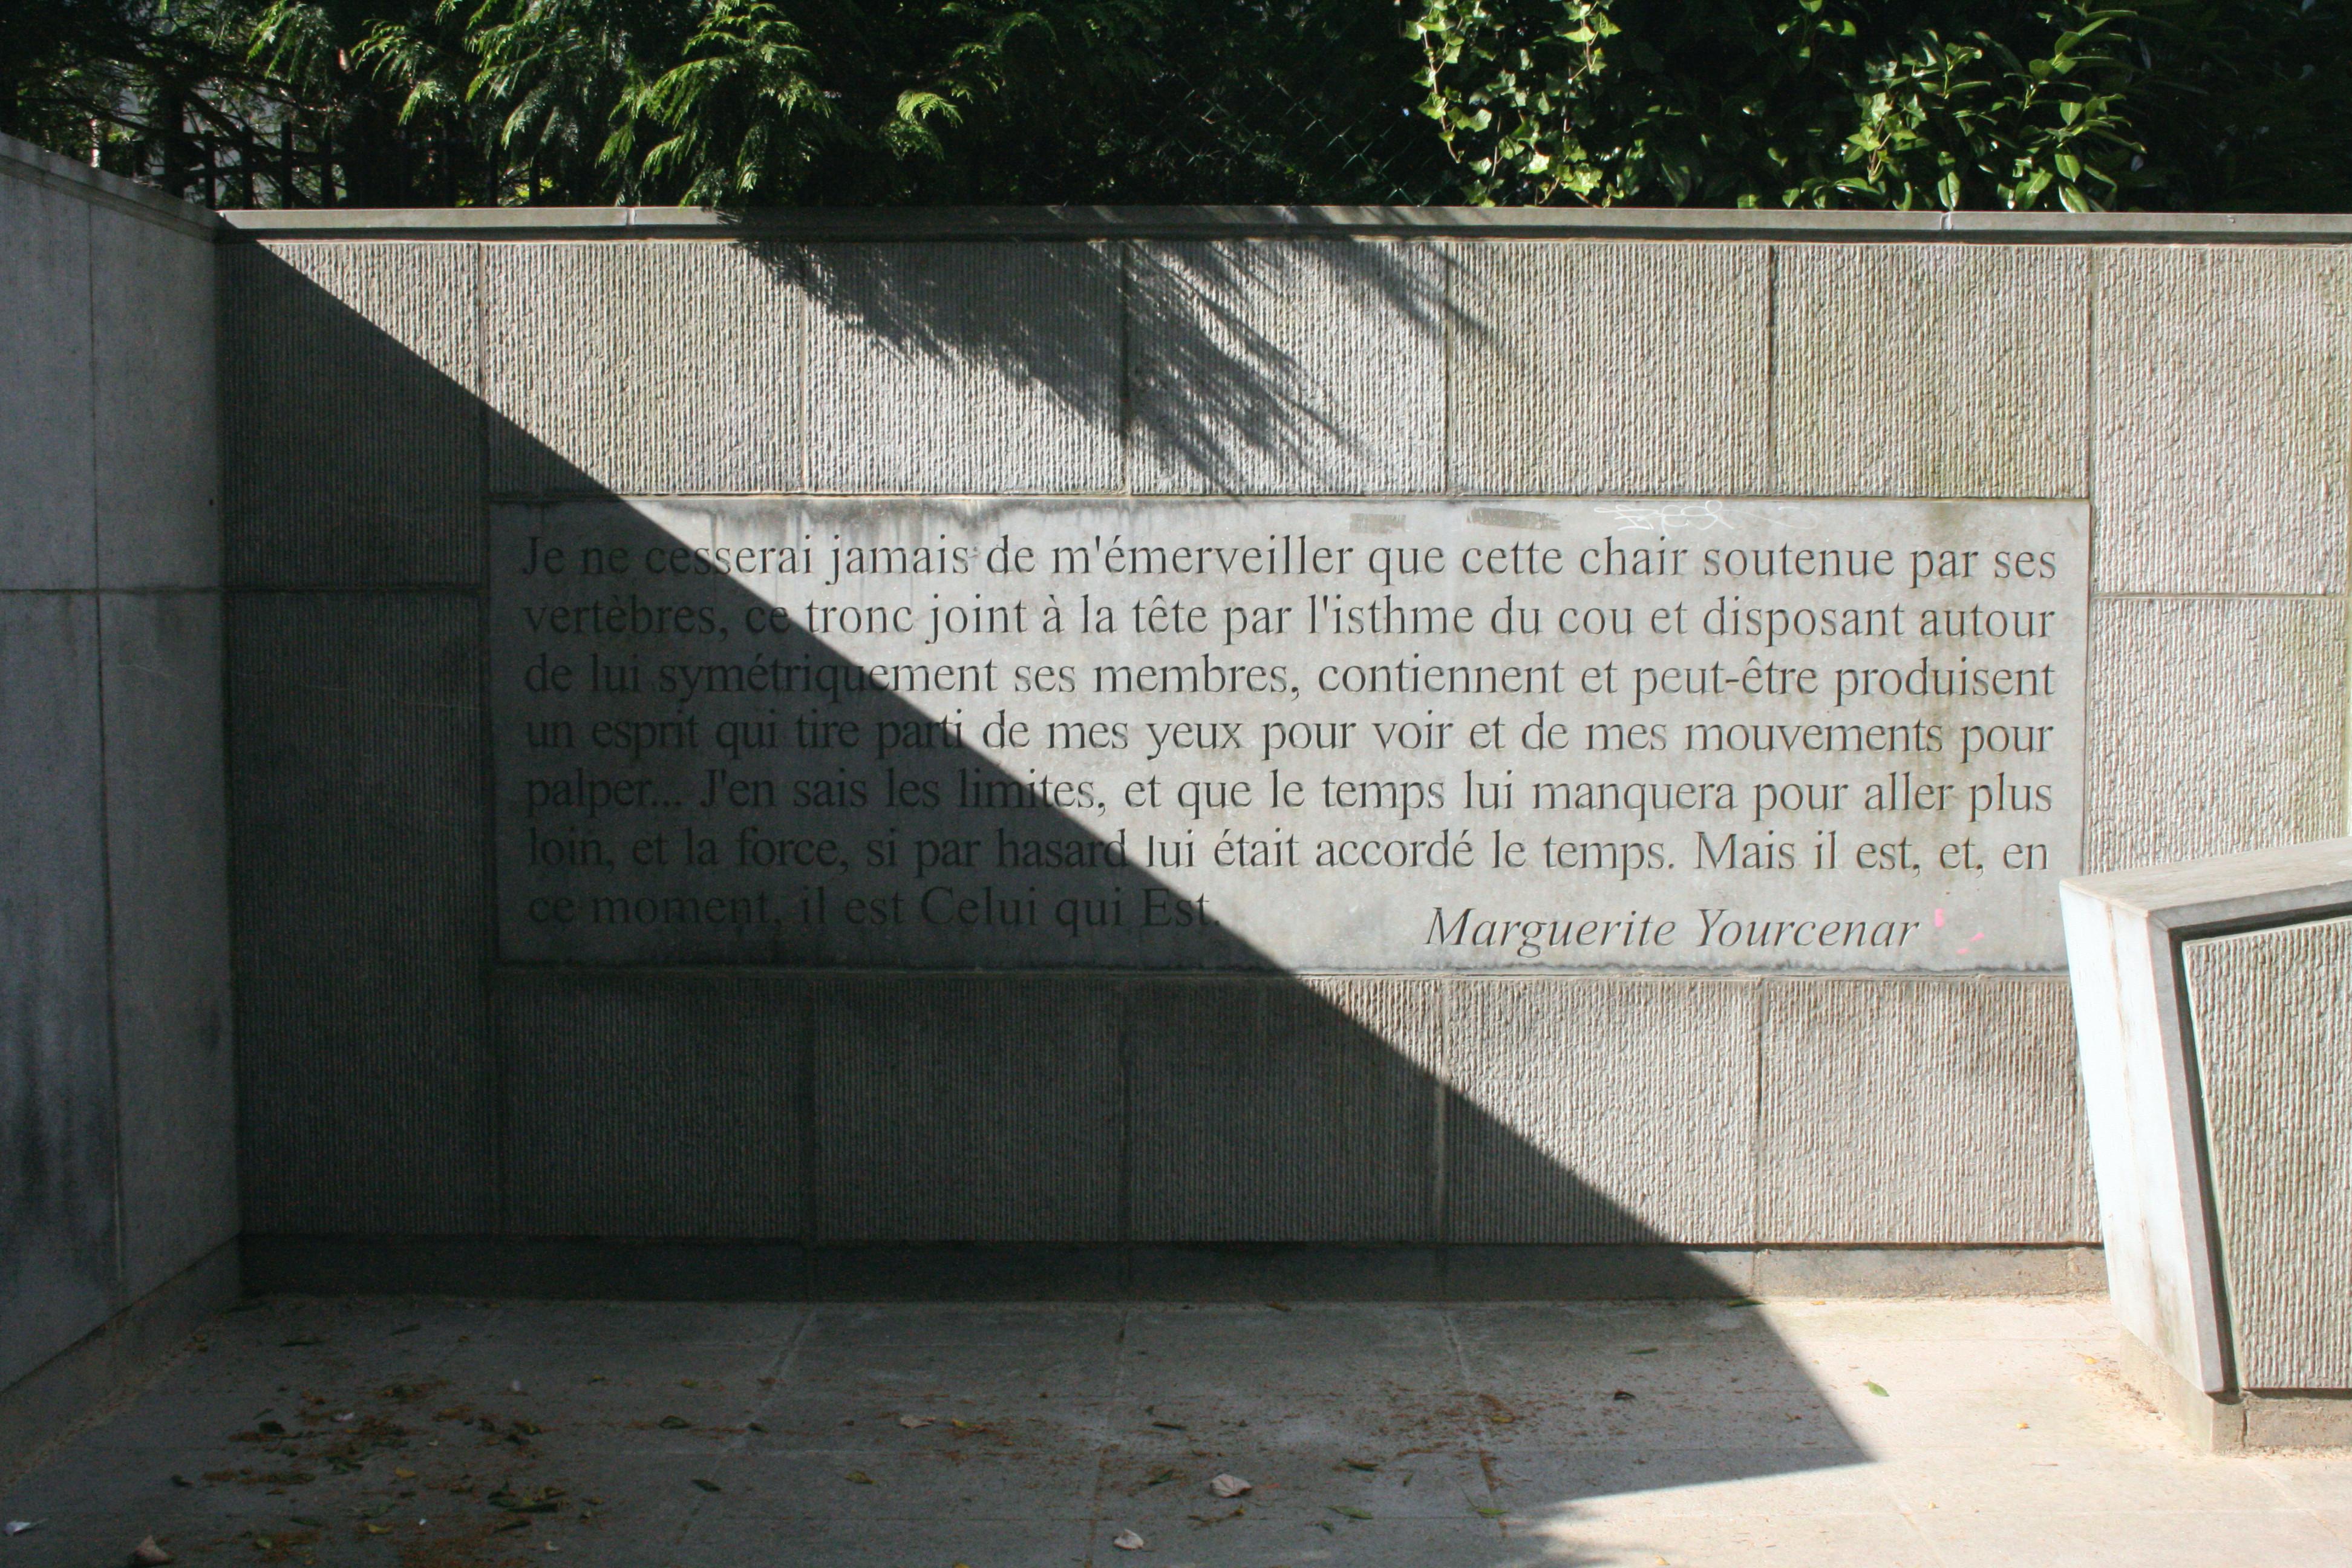 File:Bruxelles Parc d\'Egmont 811.jpg - Wikimedia Commons